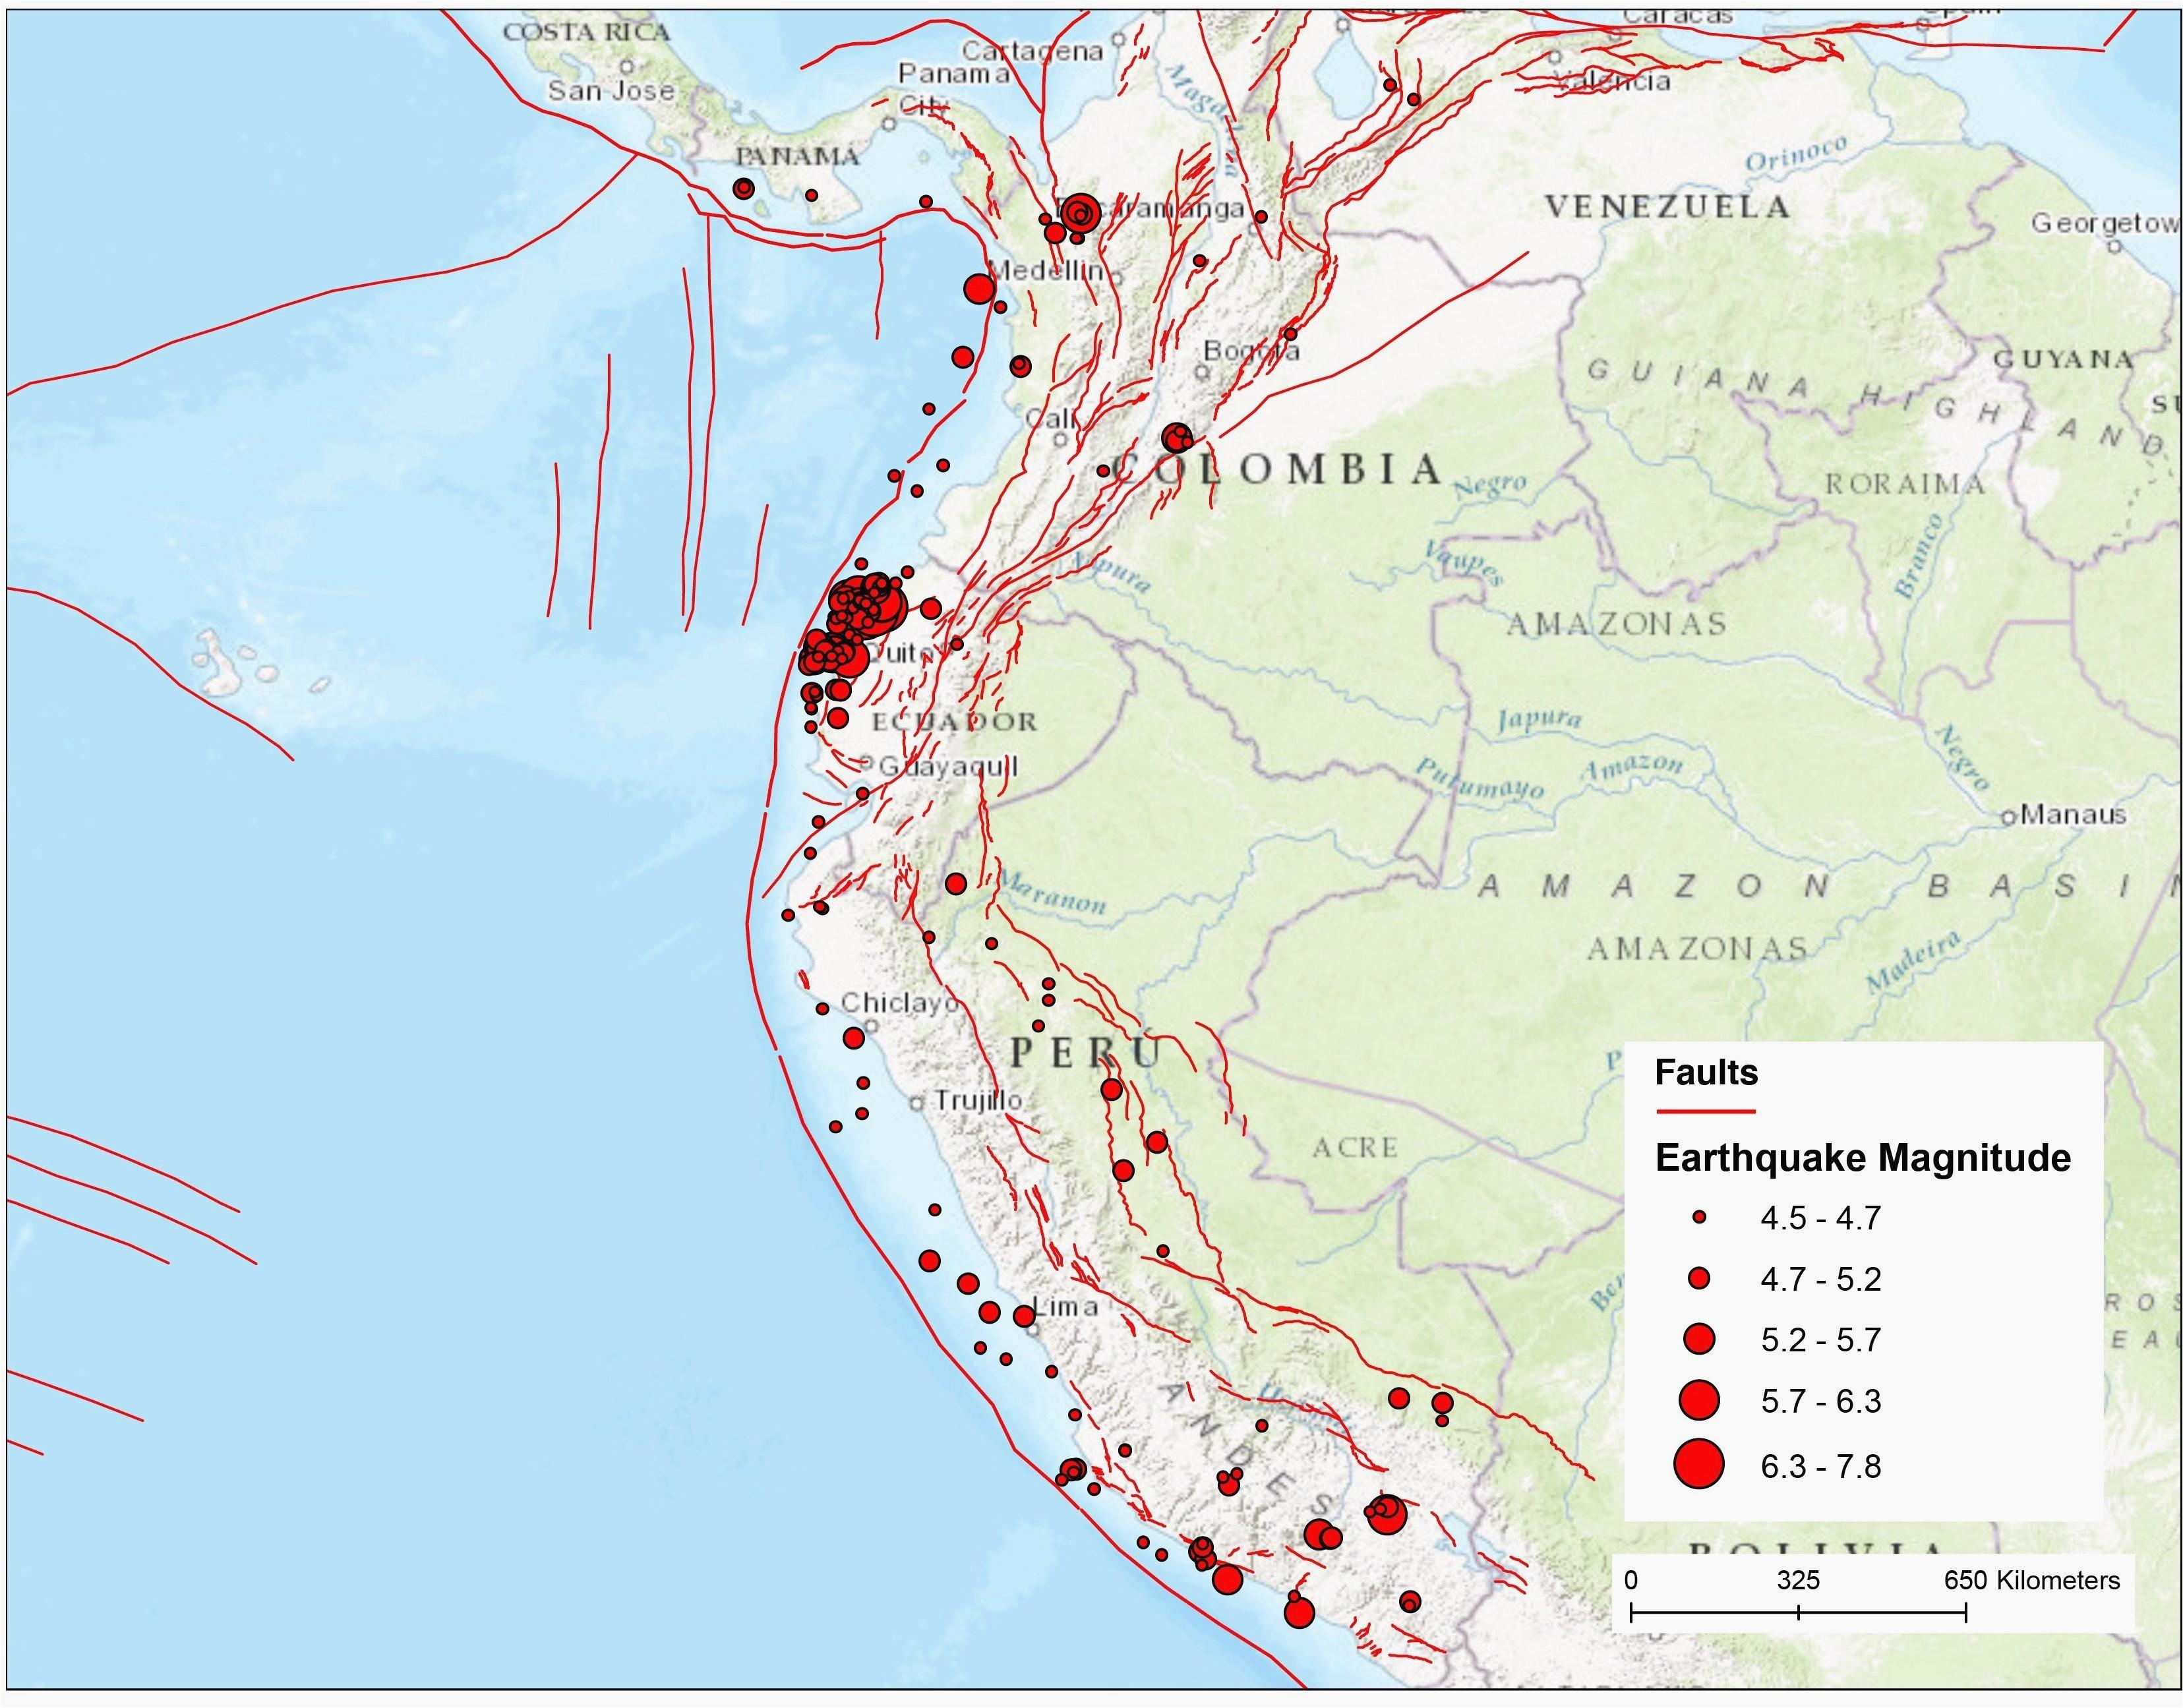 Oregon Fault Line Map southern California Fault Lines Map ...